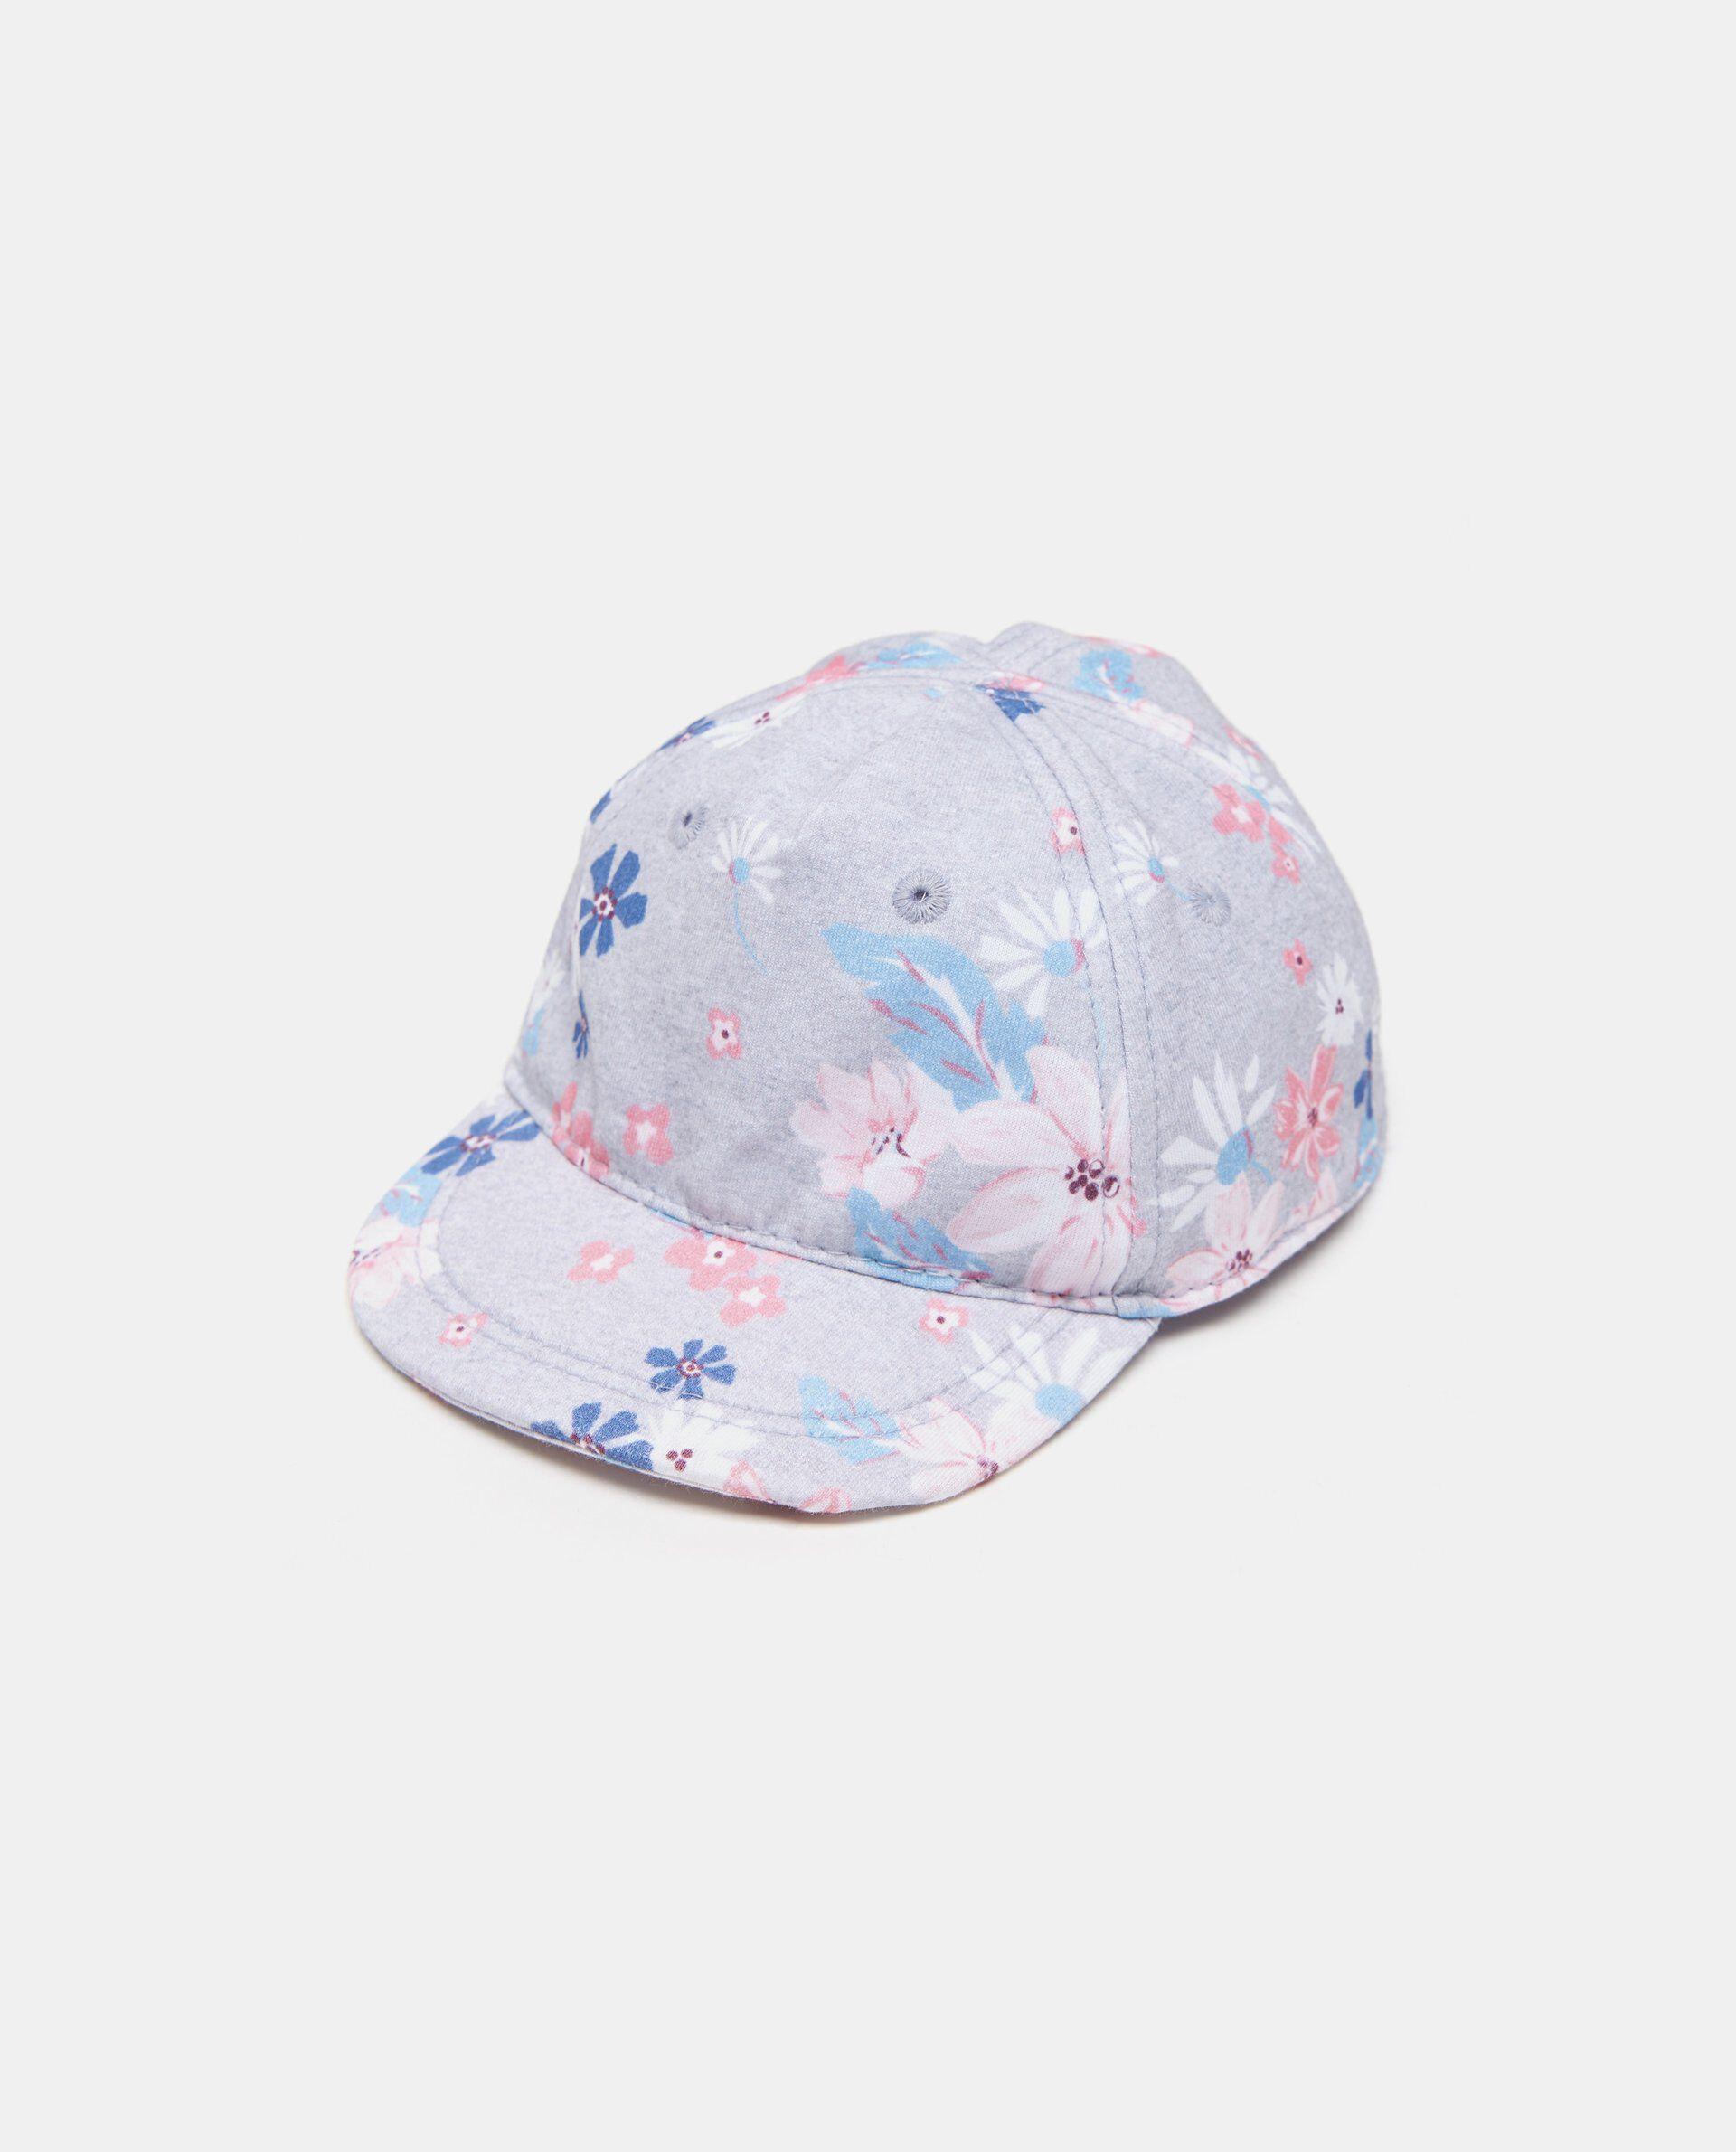 Cappellino con visiera floreale